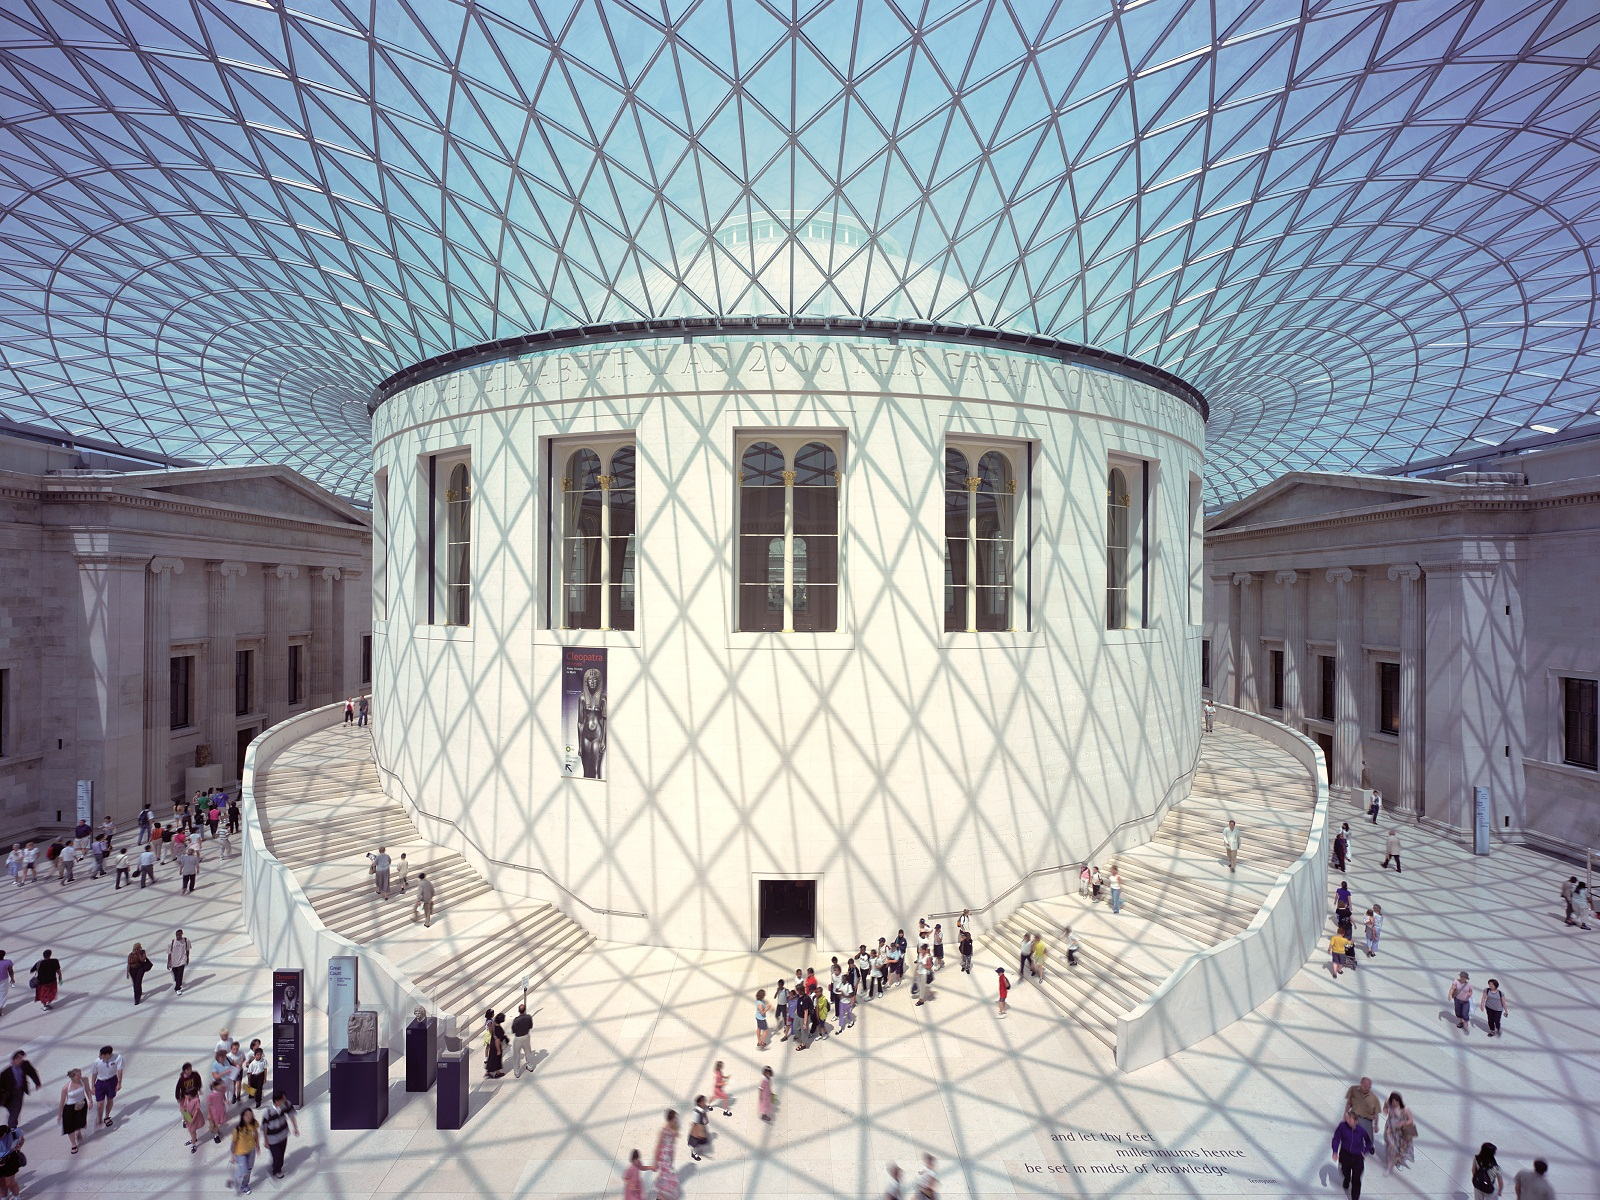 London Architecture Photos London Architecture United